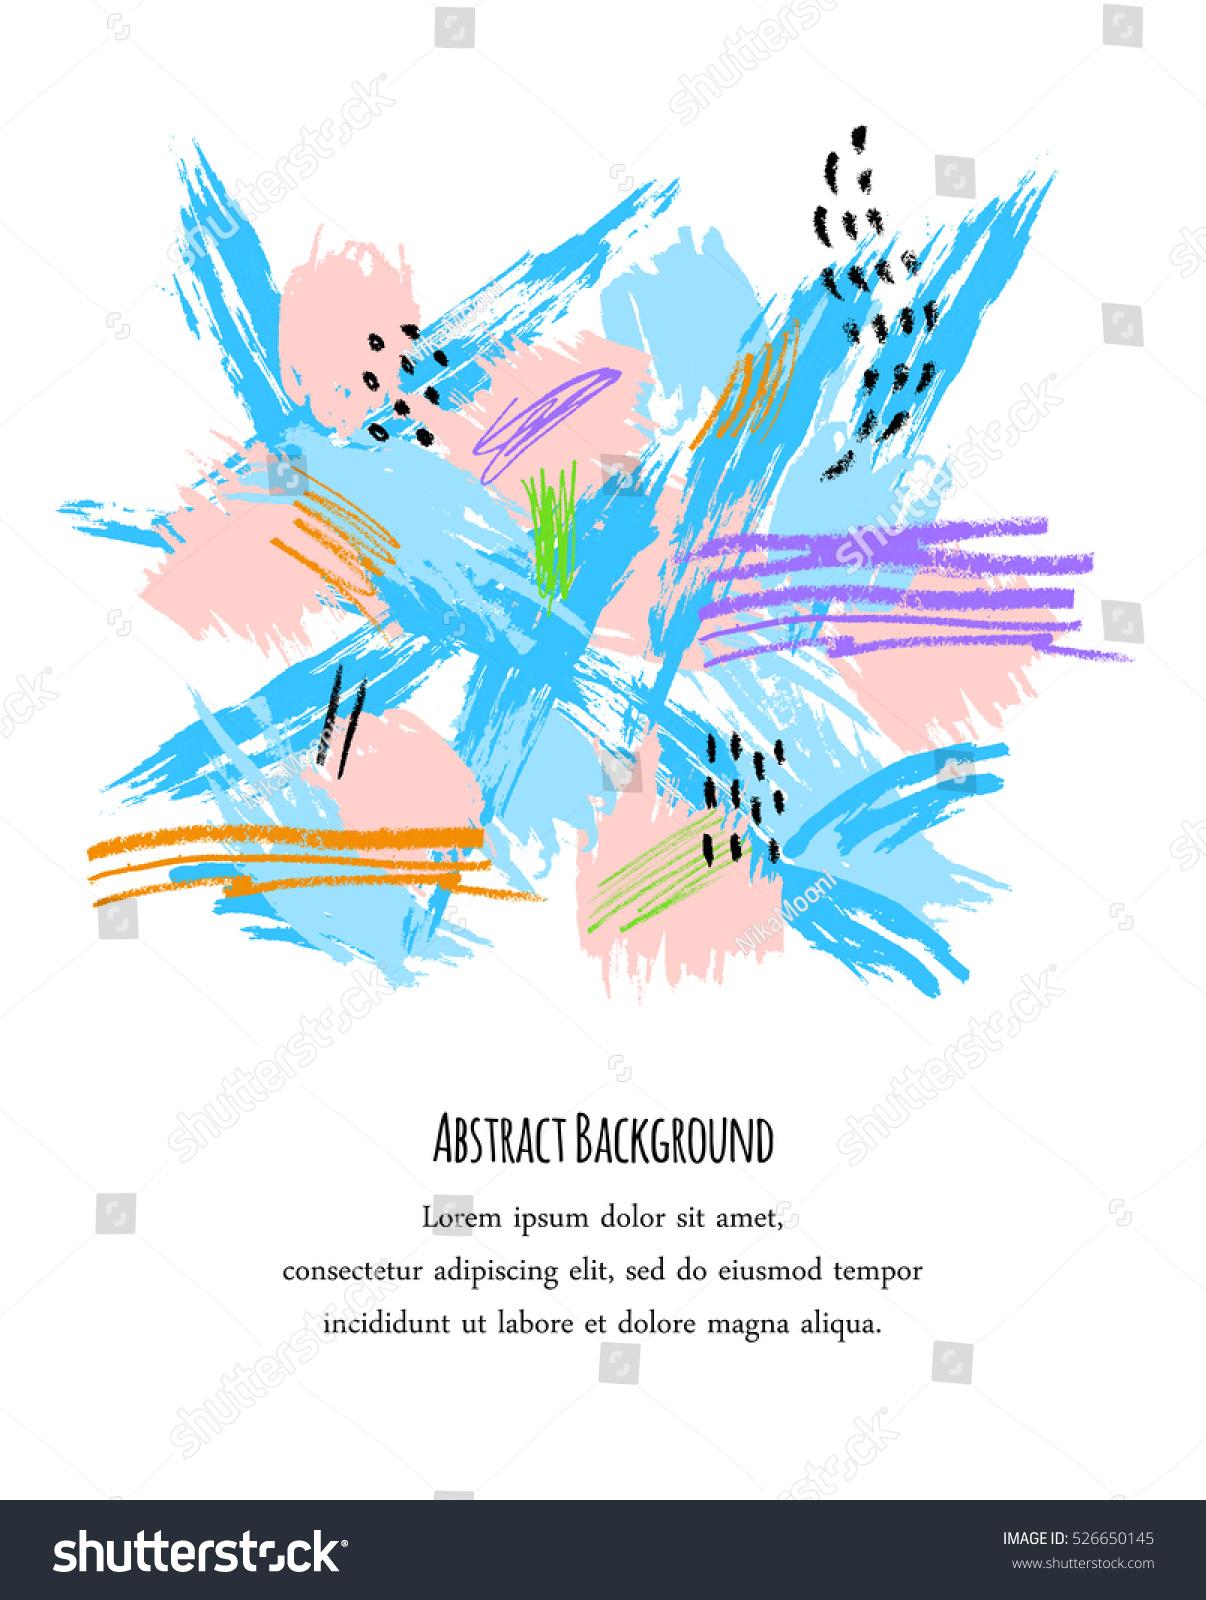 Abstract Creative Background Hand Drawn Textures Vector de stock ...